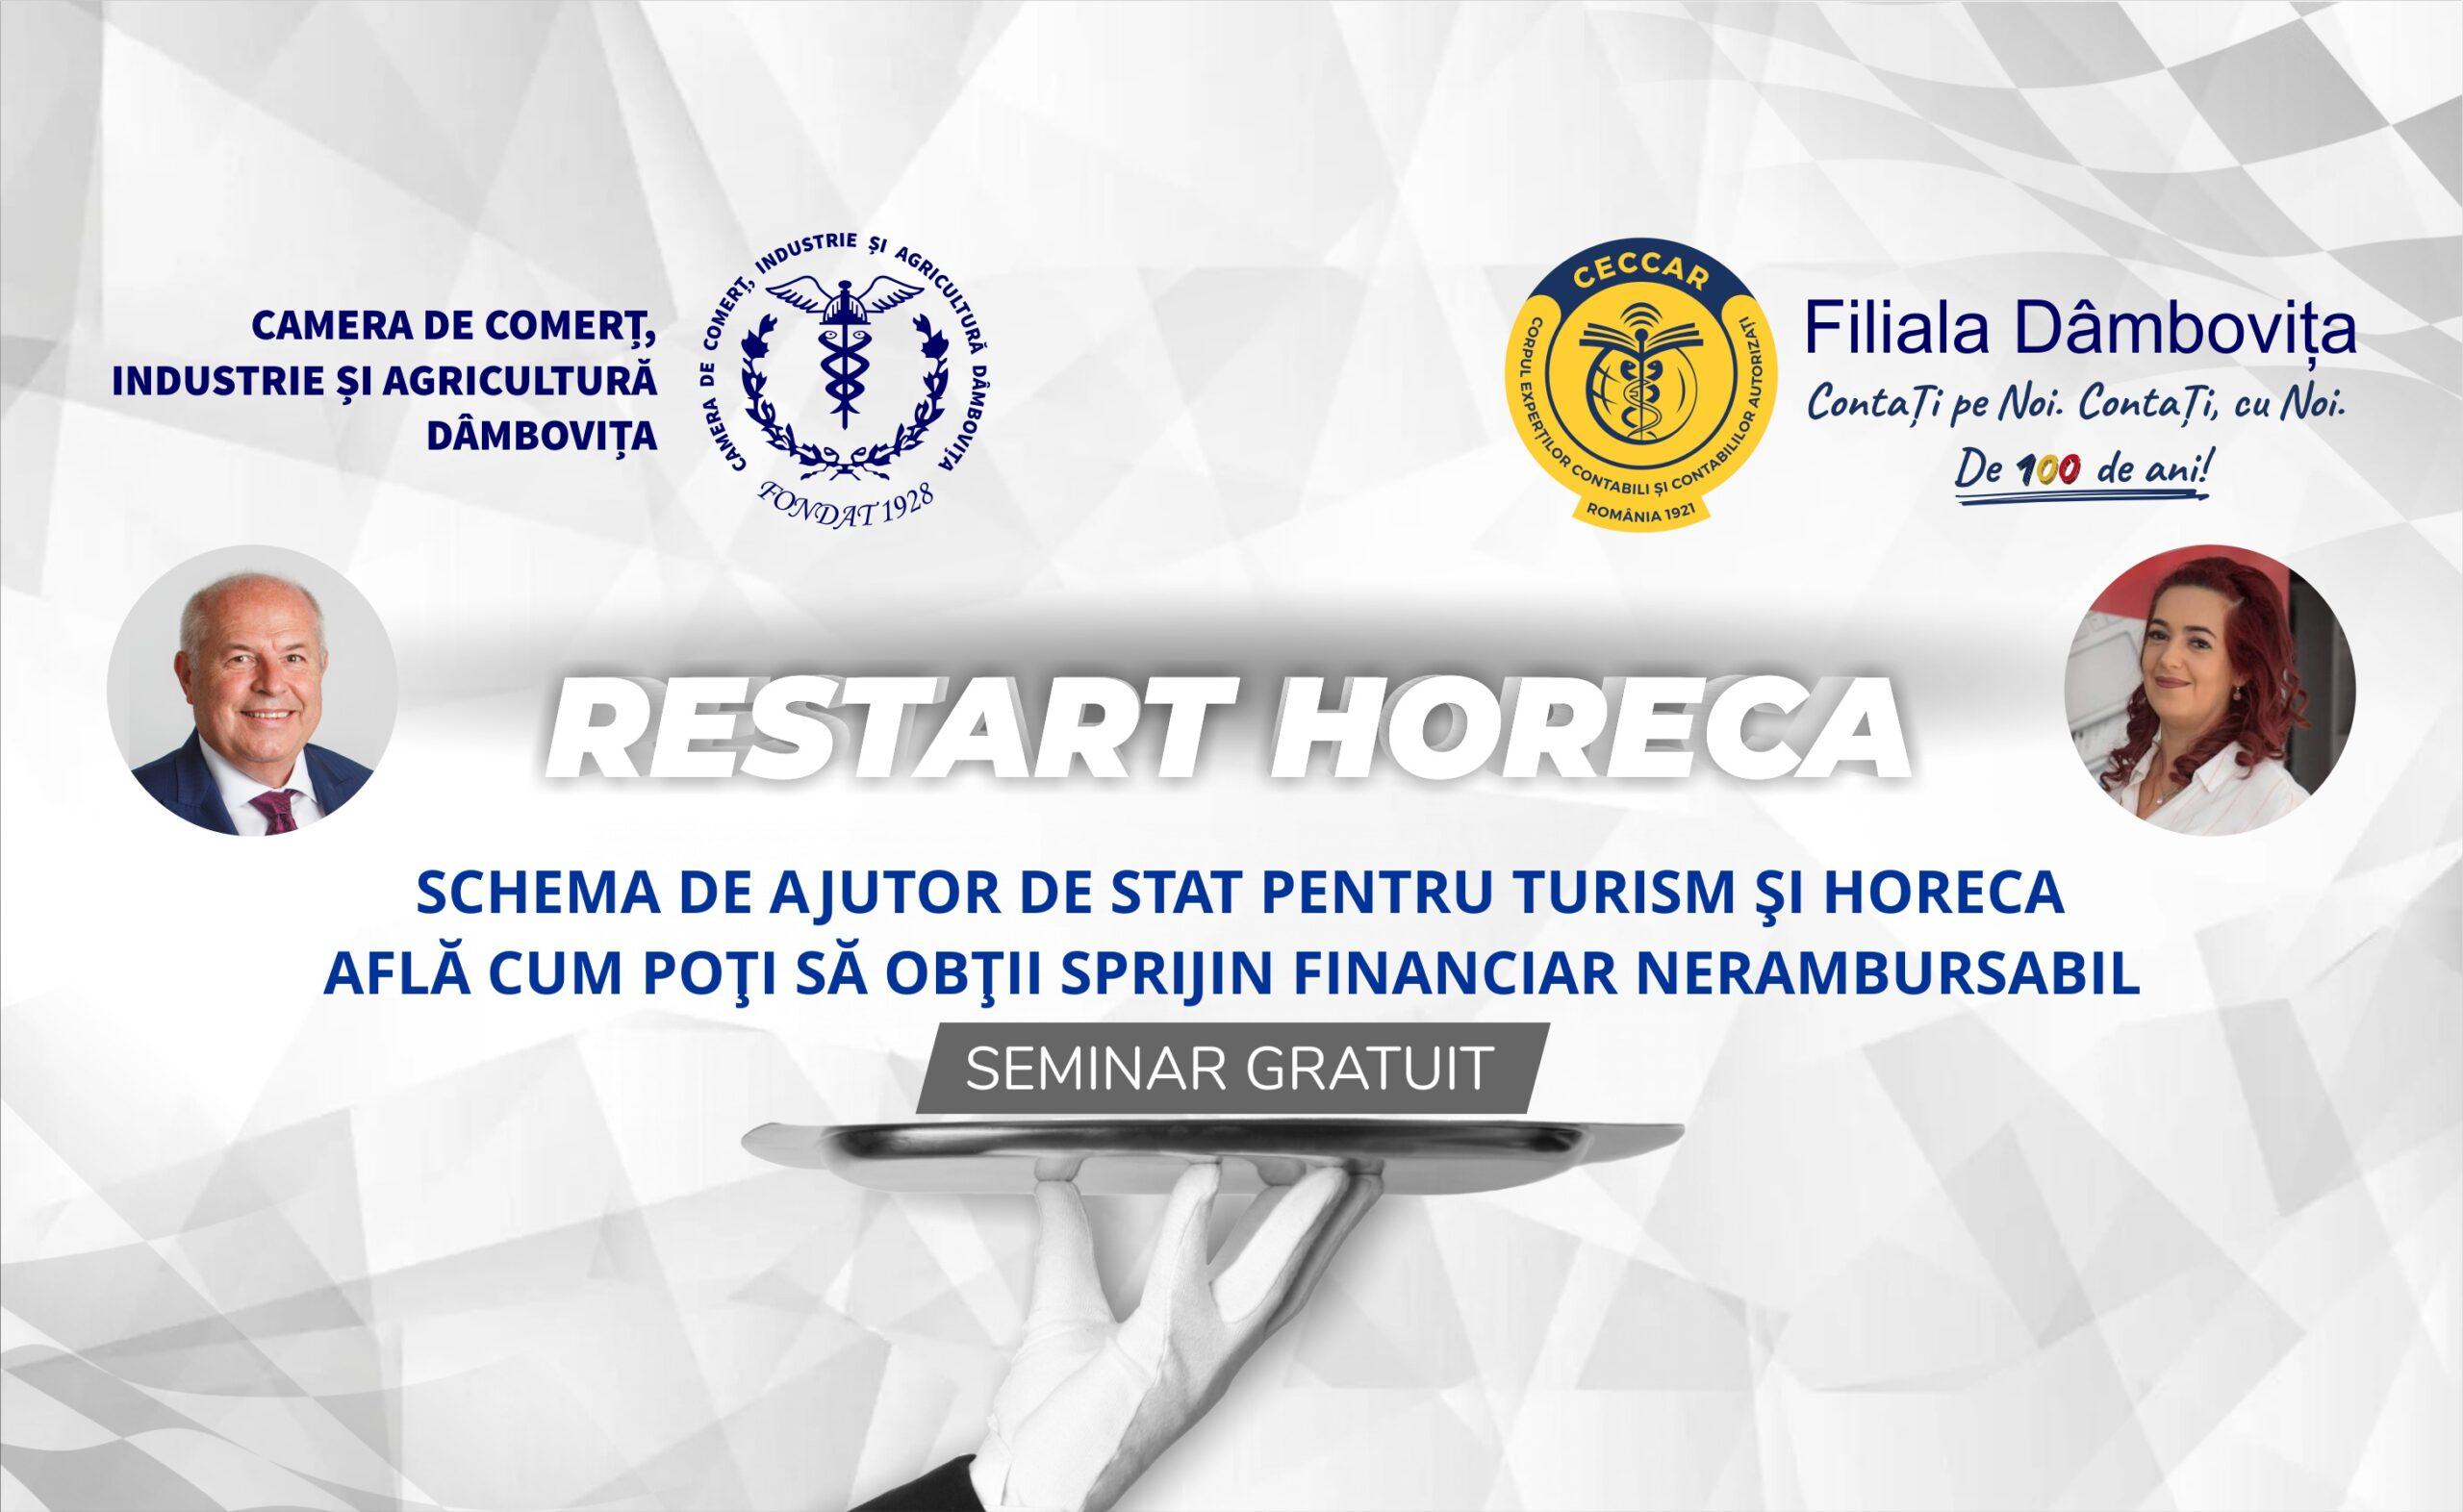 You are currently viewing SEMINAR GRATUIT: Restart HoReCA